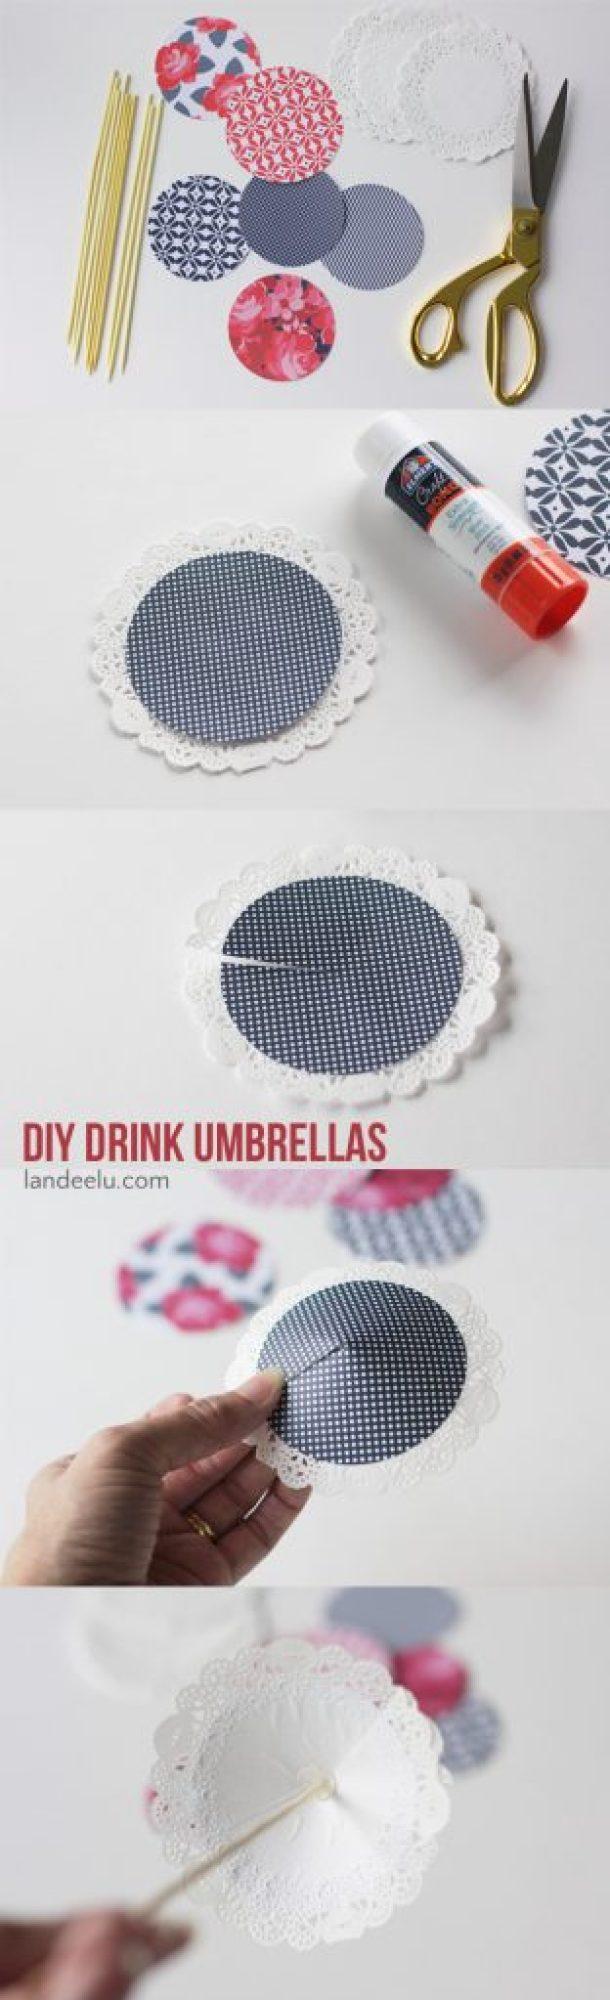 Patriotic DIY Drink Umbrellas    landeelu.com  Spruce up your 4th of July celebrations with these adorable drink umbrellas!